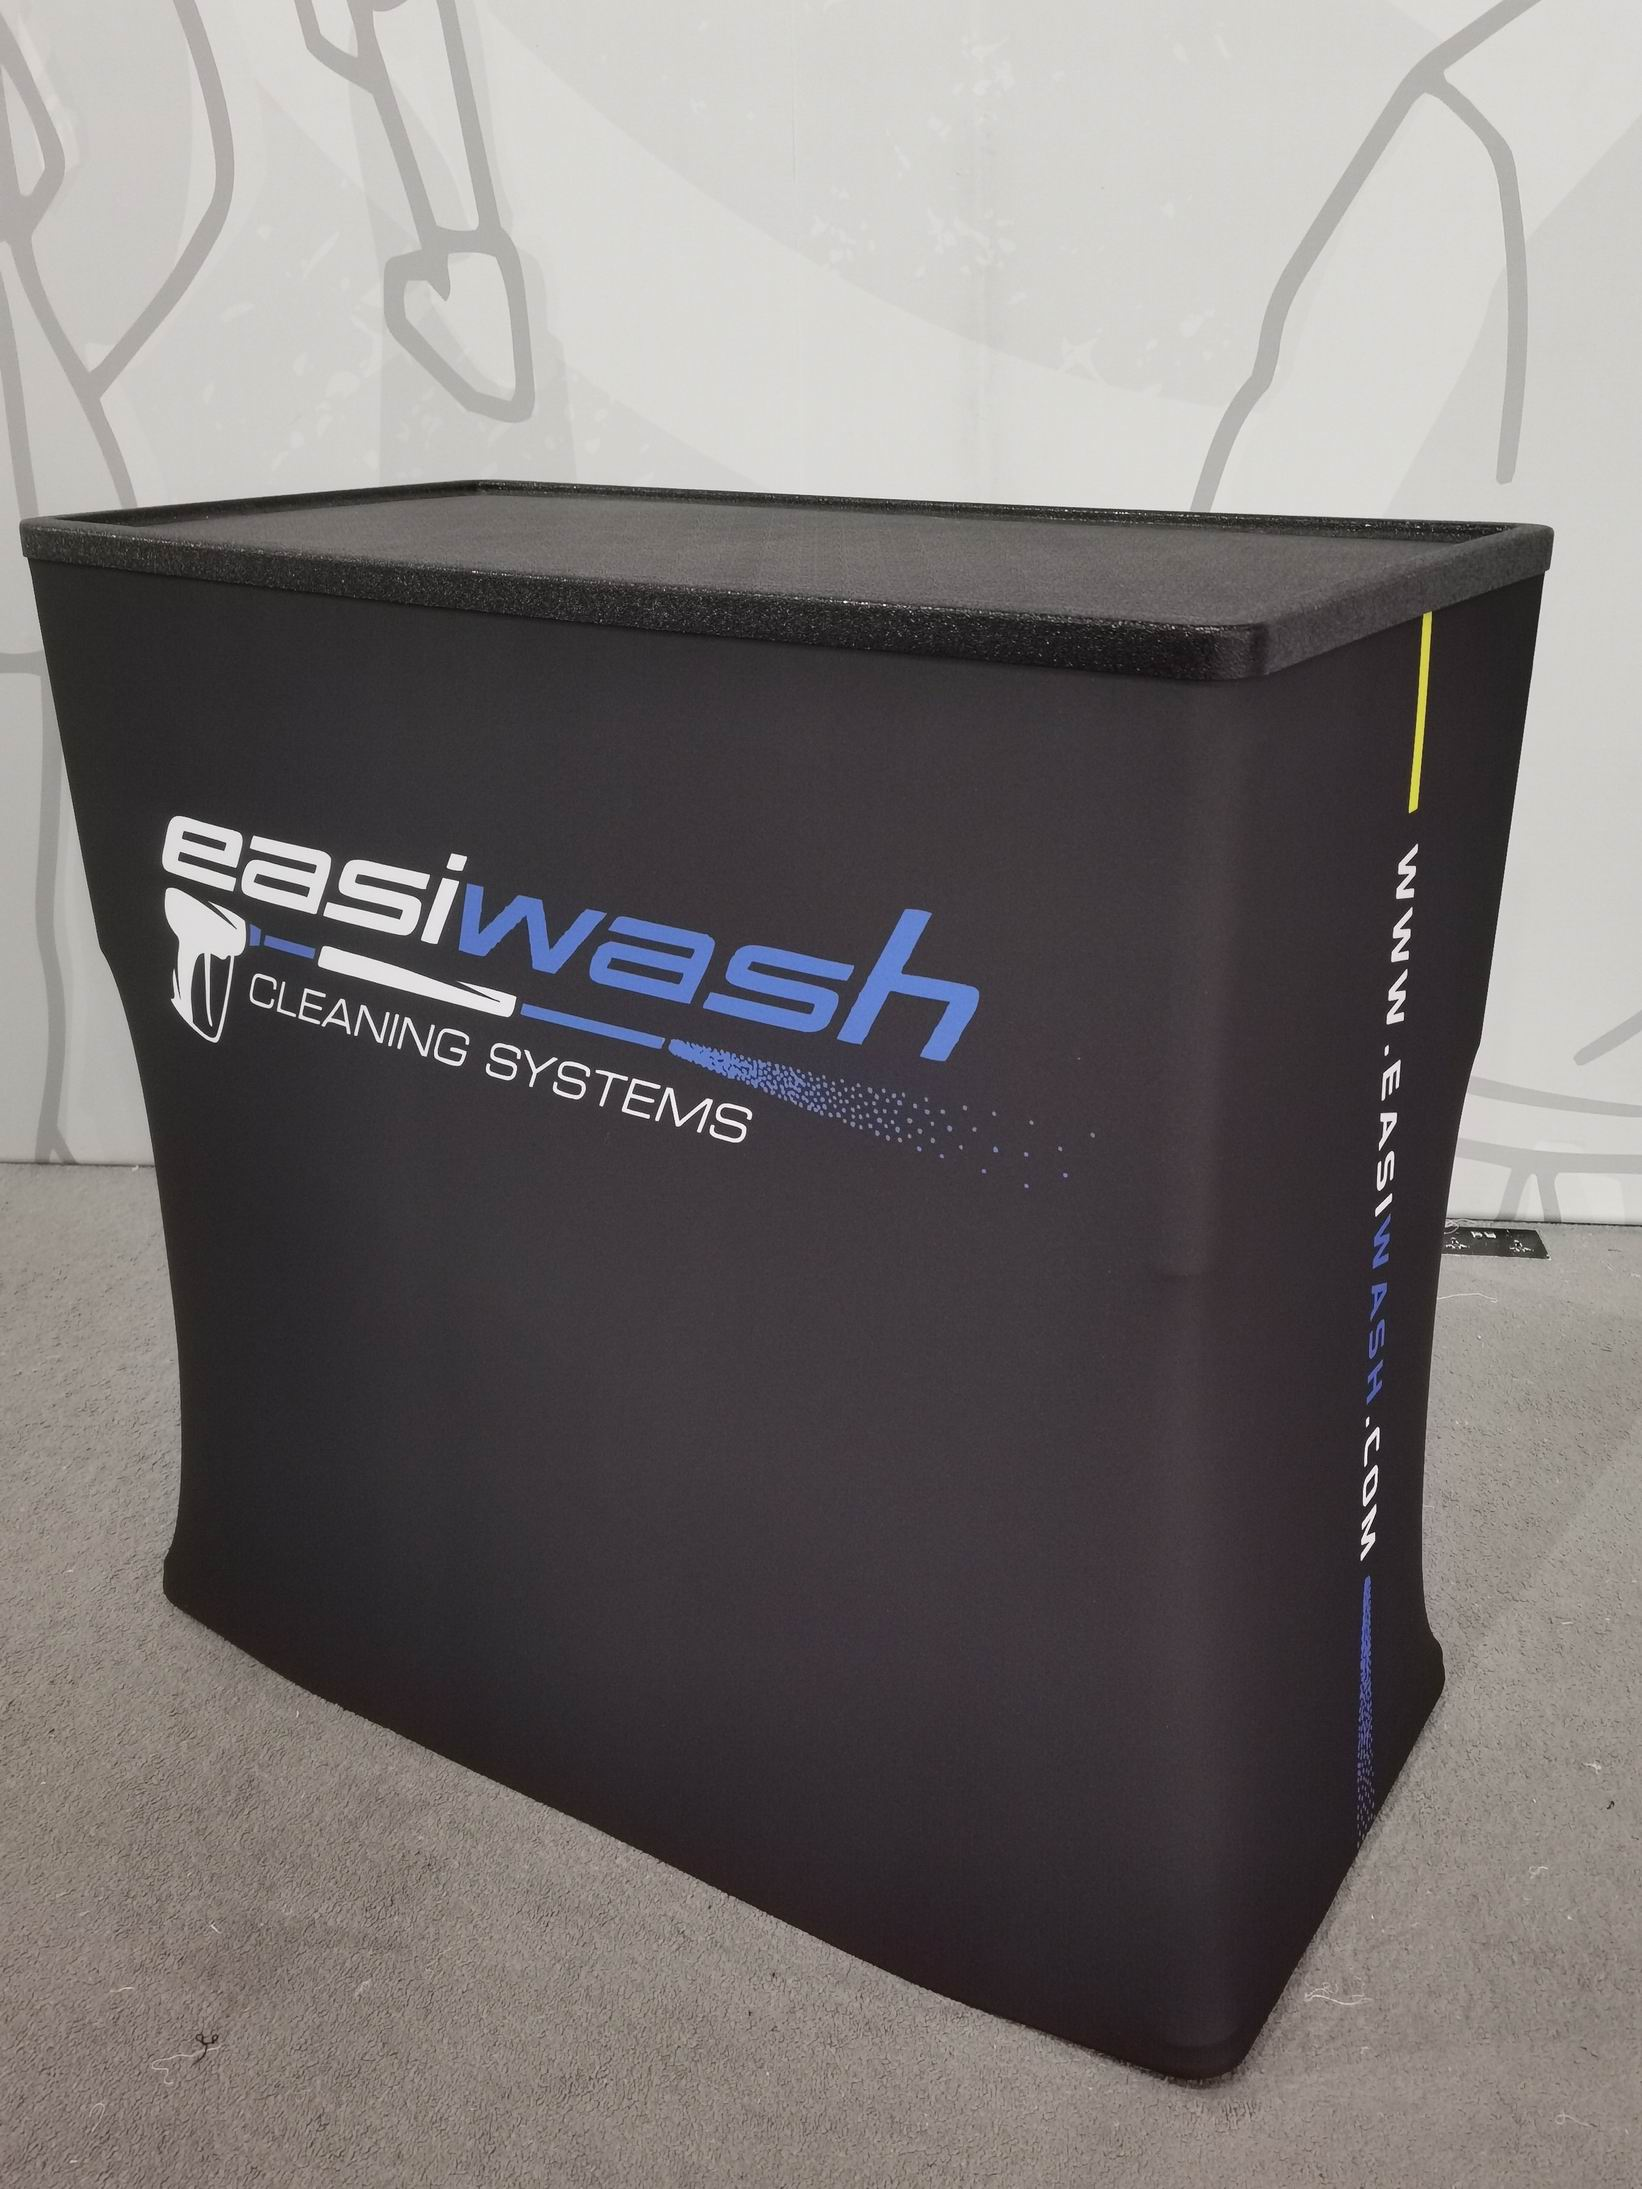 CA600 hard shipping case production photo